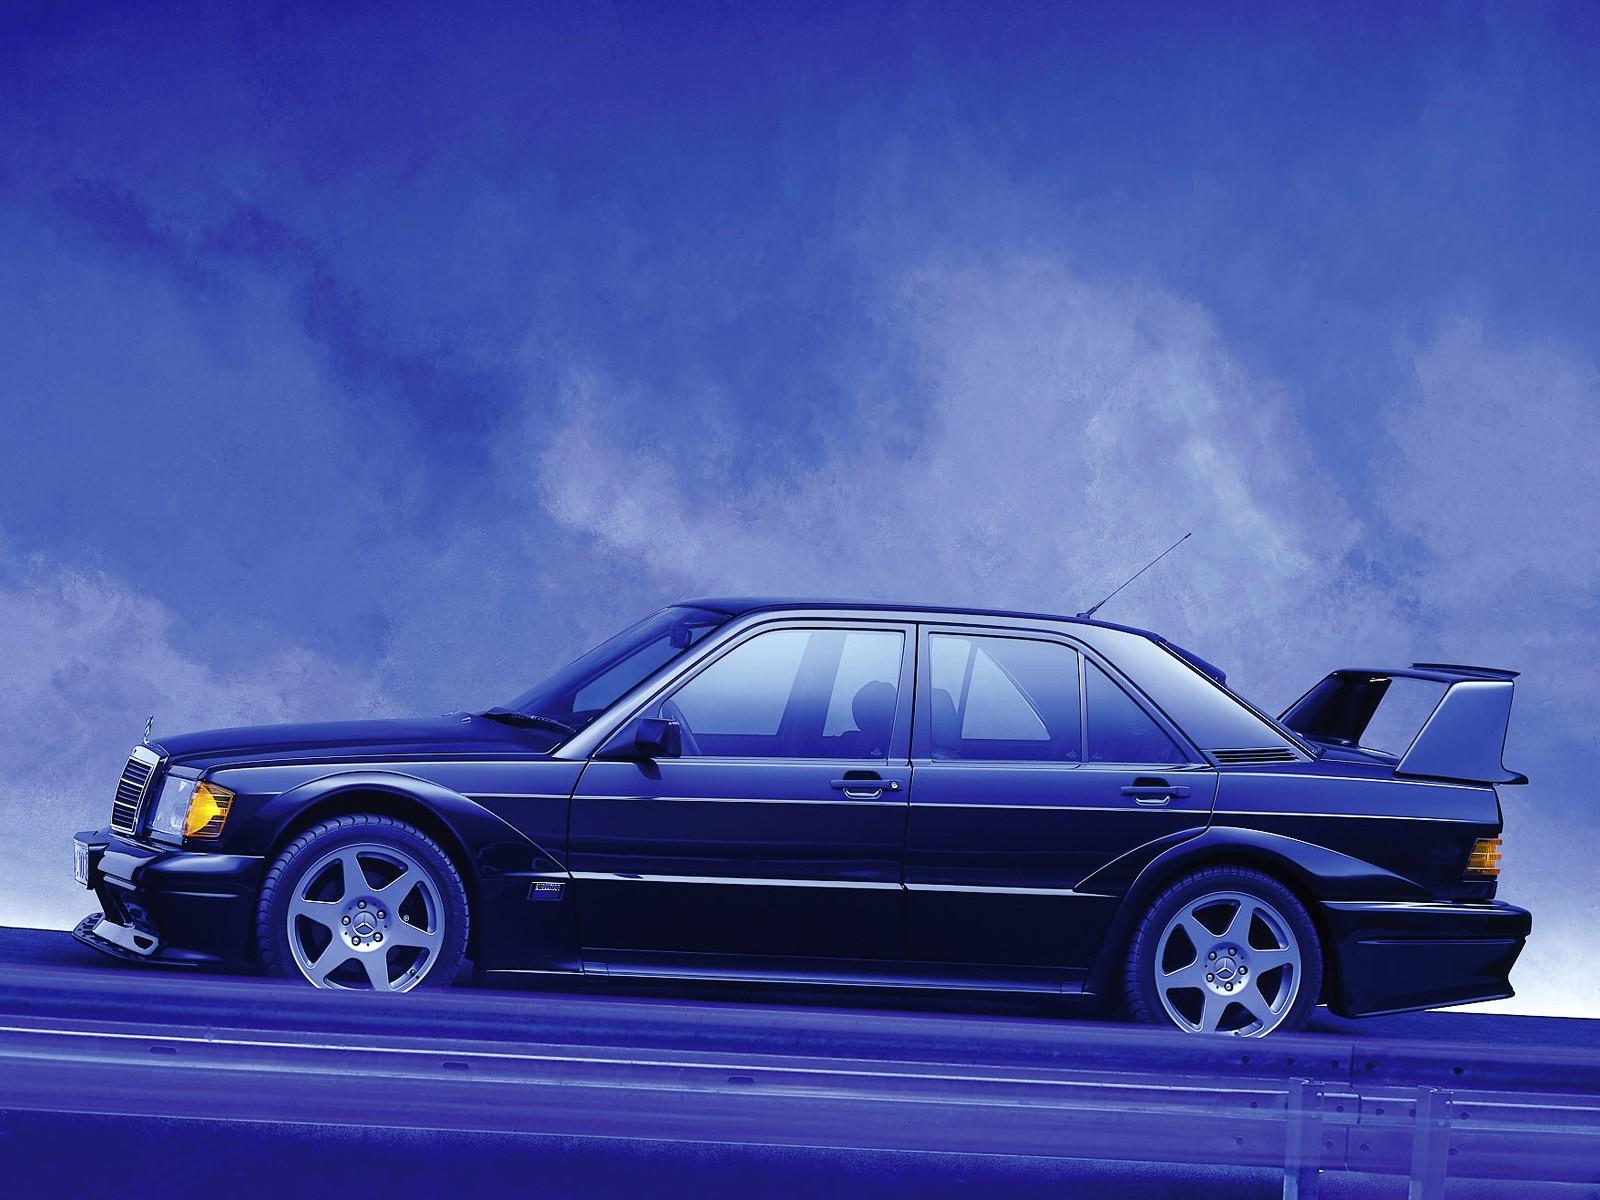 mercedes benz 190 e 2 5 16 evolution ii 1990 1991 autoevolution. Black Bedroom Furniture Sets. Home Design Ideas